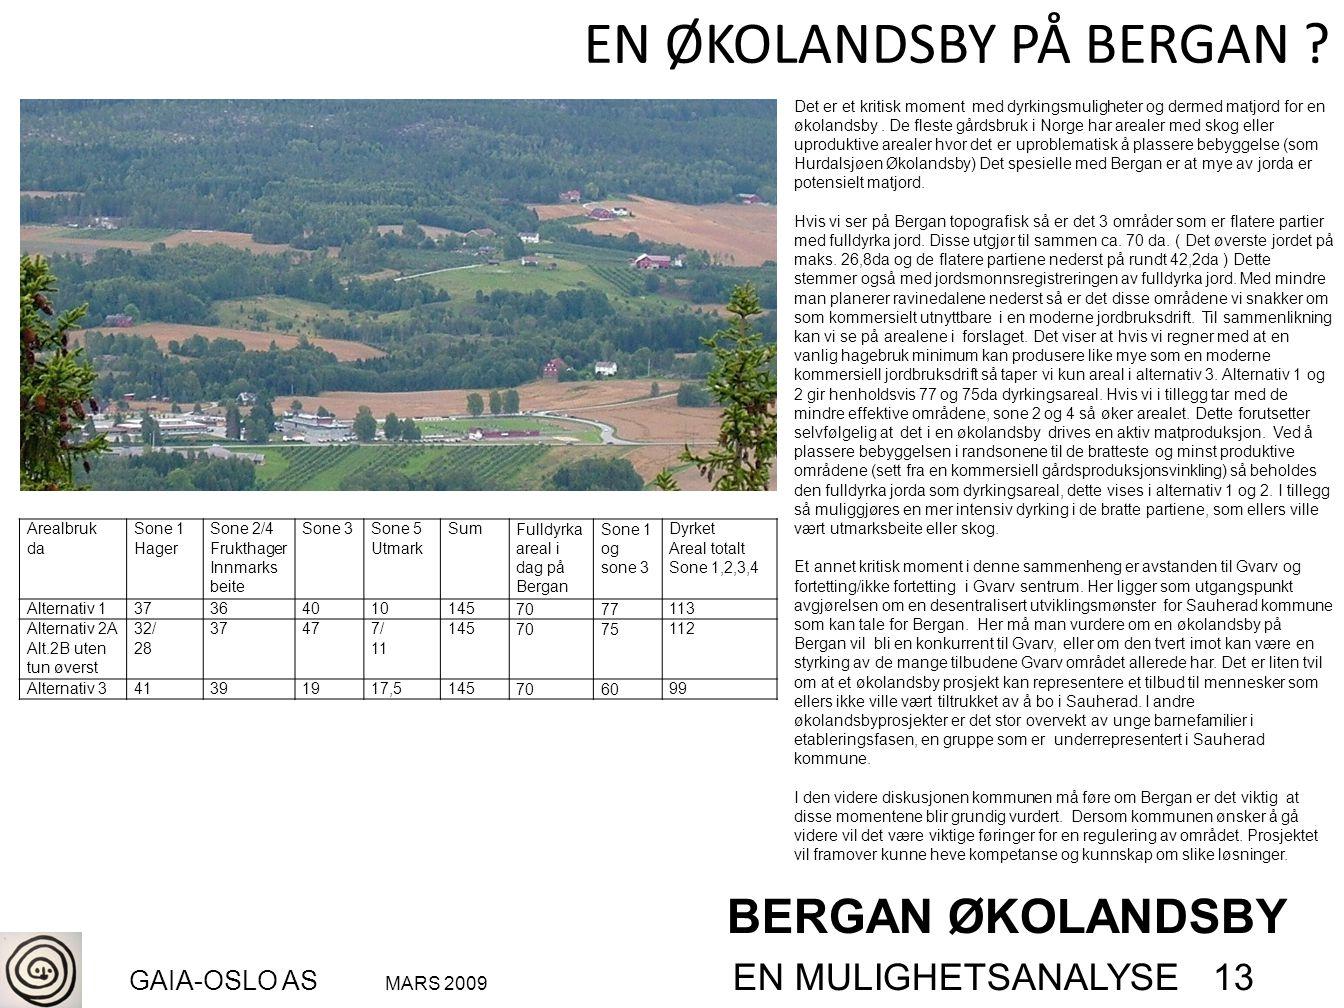 BERGAN ØKOLANDSBY GAIA-OSLO AS MARS 2009 EN MULIGHETSANALYSE 13